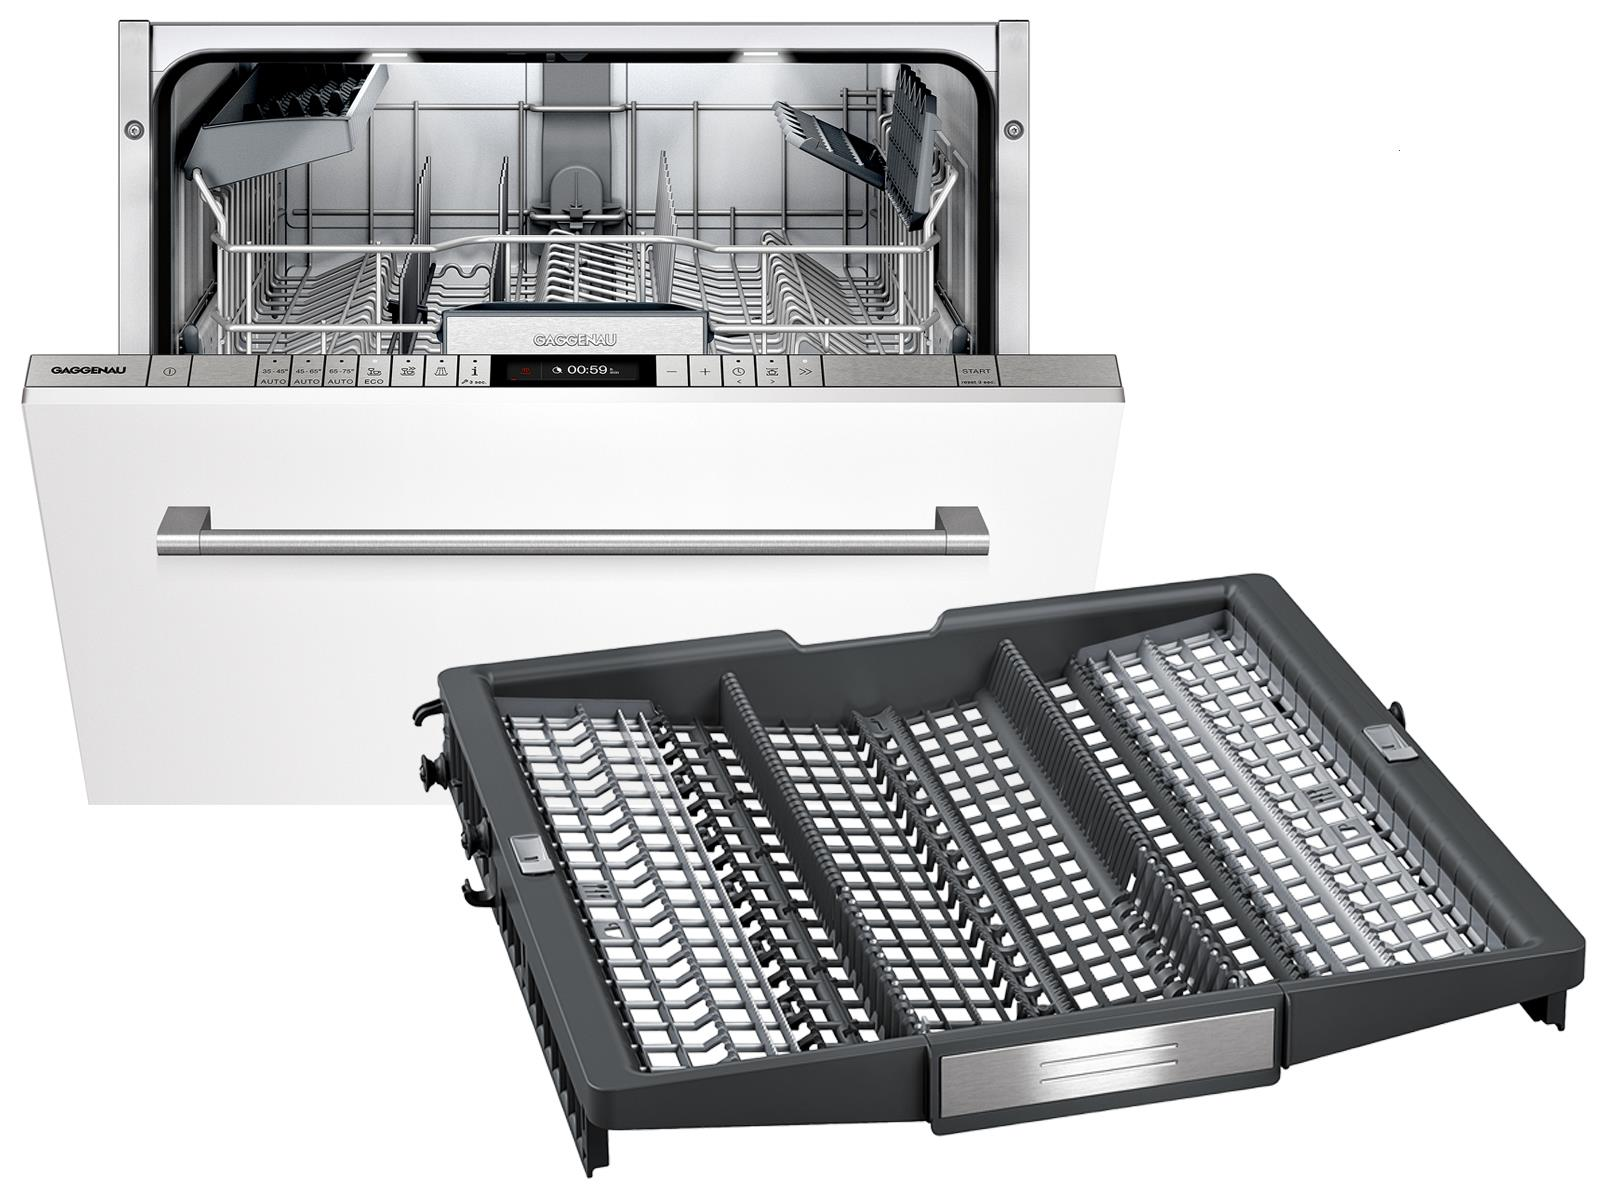 Gaggenau DF 251 160 BS Serie 200 Vollintegrierbarer Einbaugeschirrspüler XXL inkl. Besteckschublade